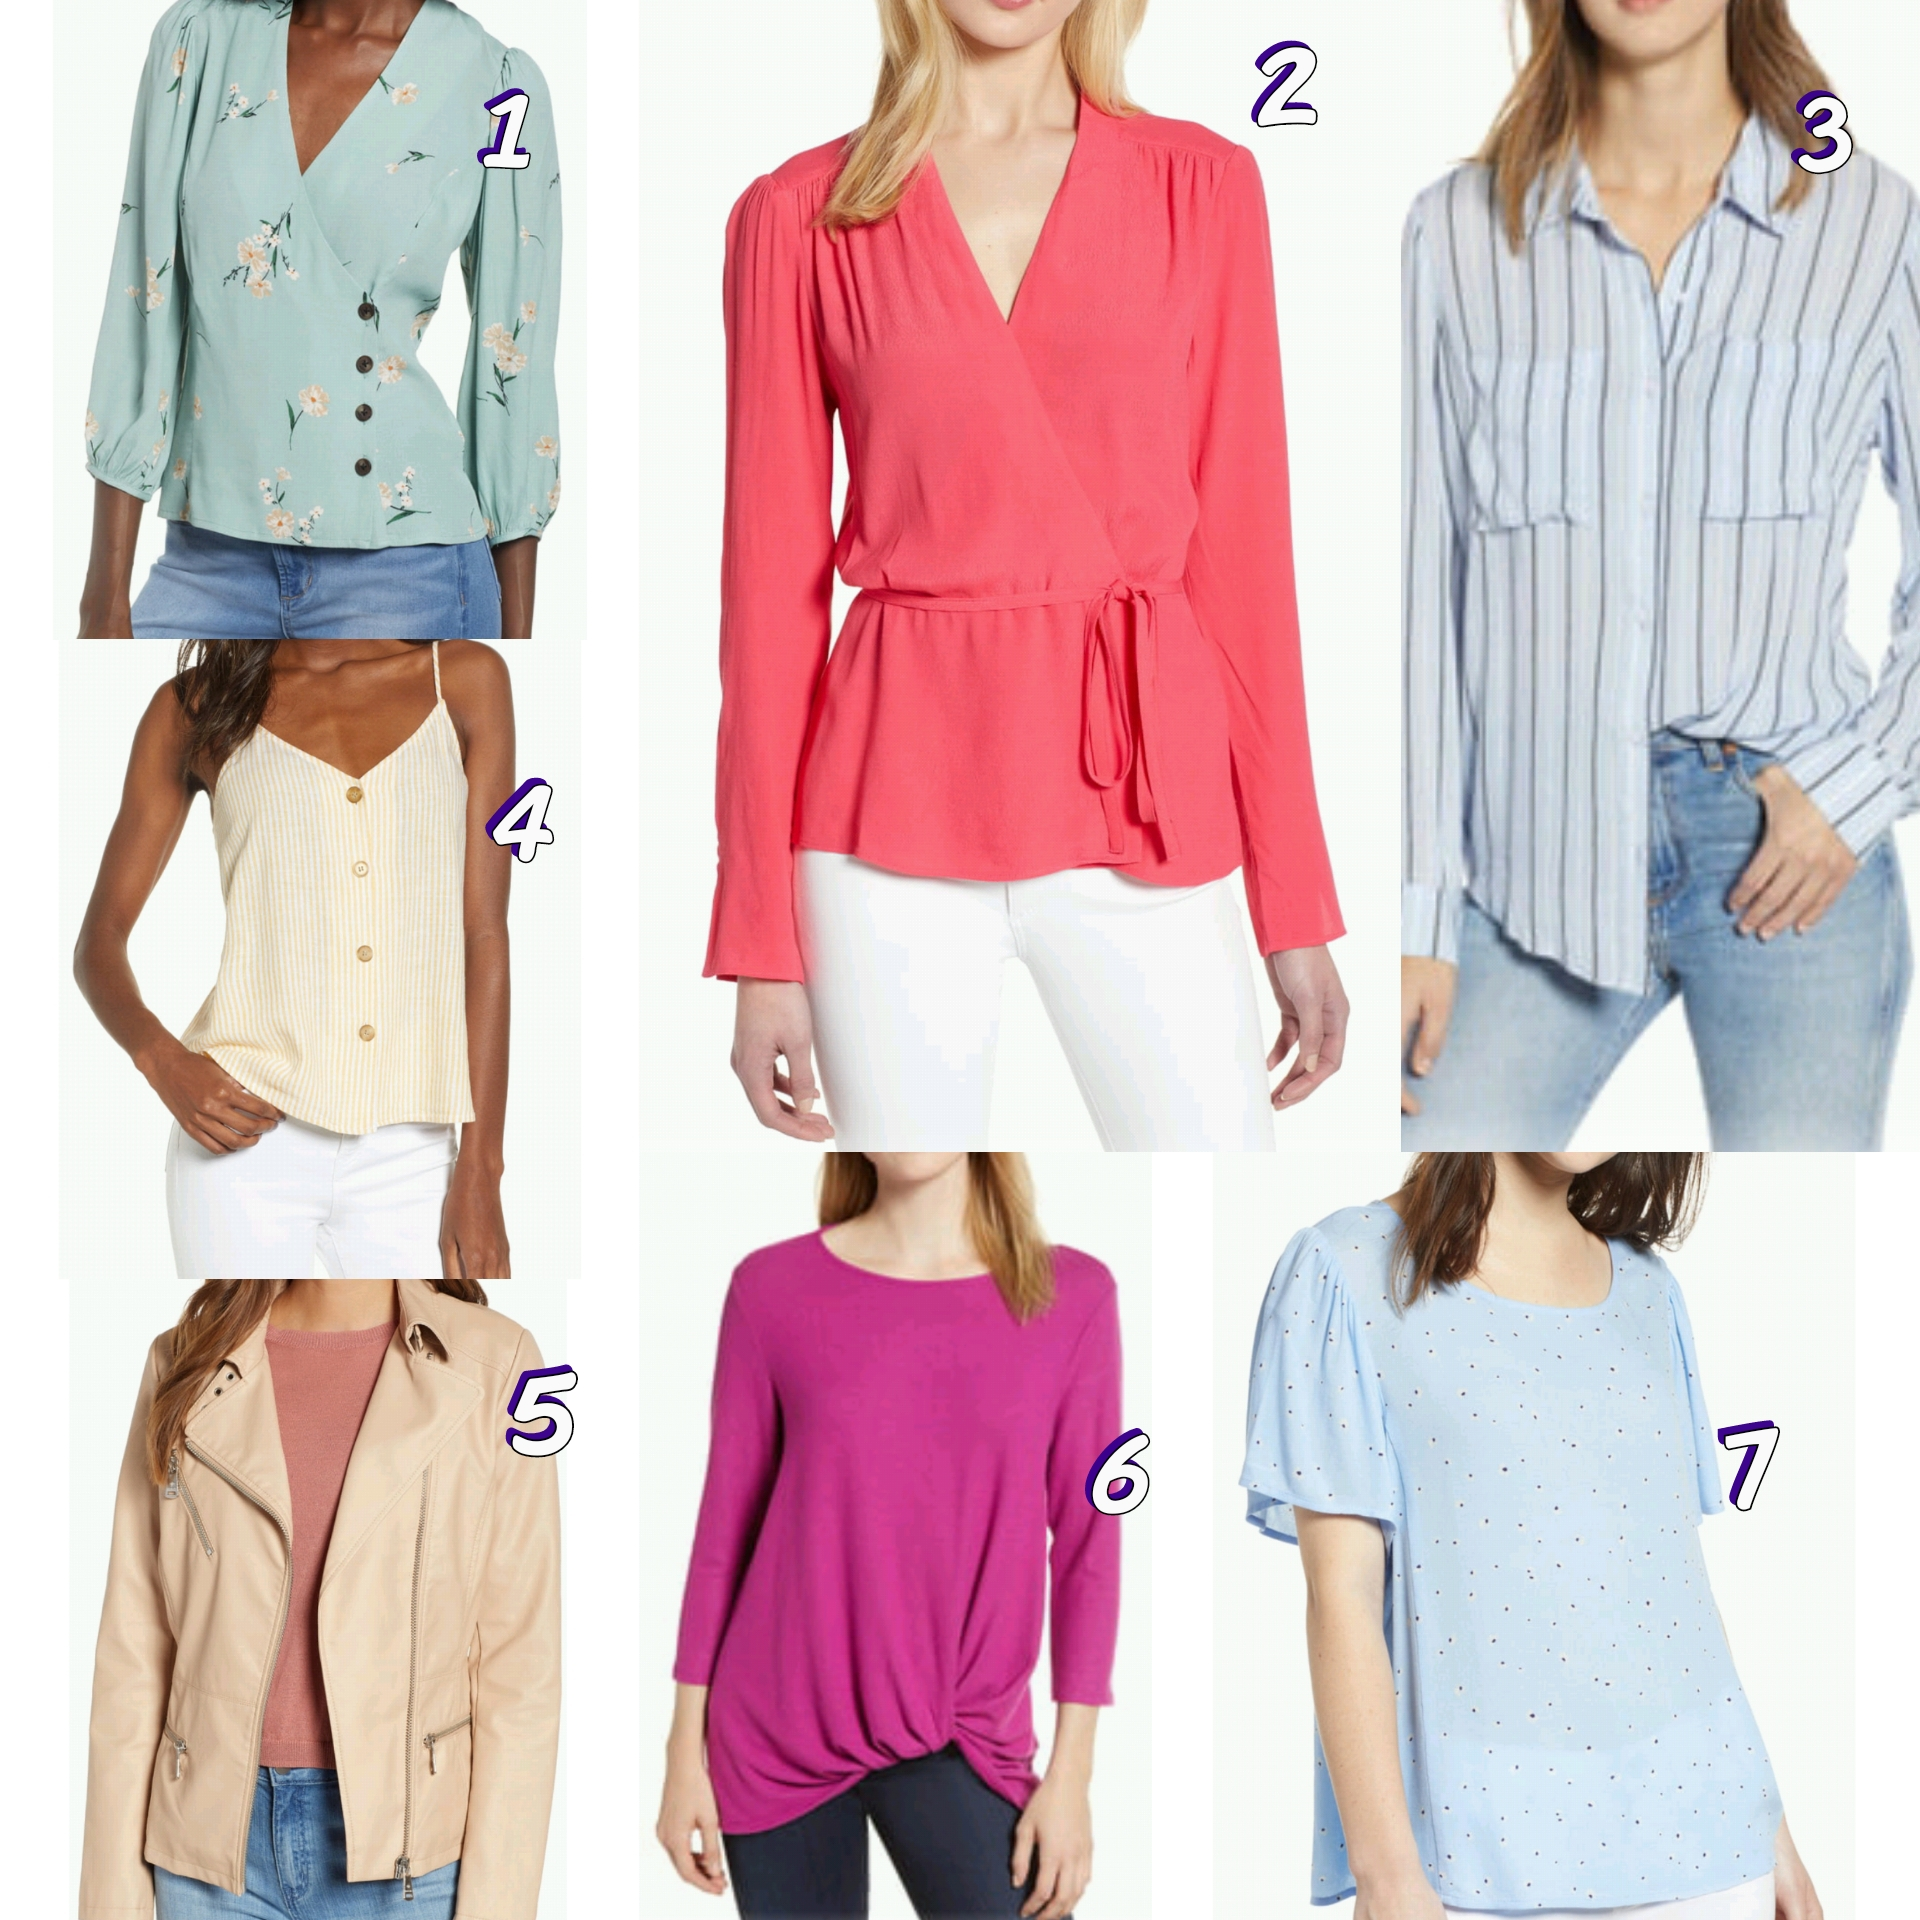 Nordstrom-spring-sale-picks-fabulouslyoverdressed